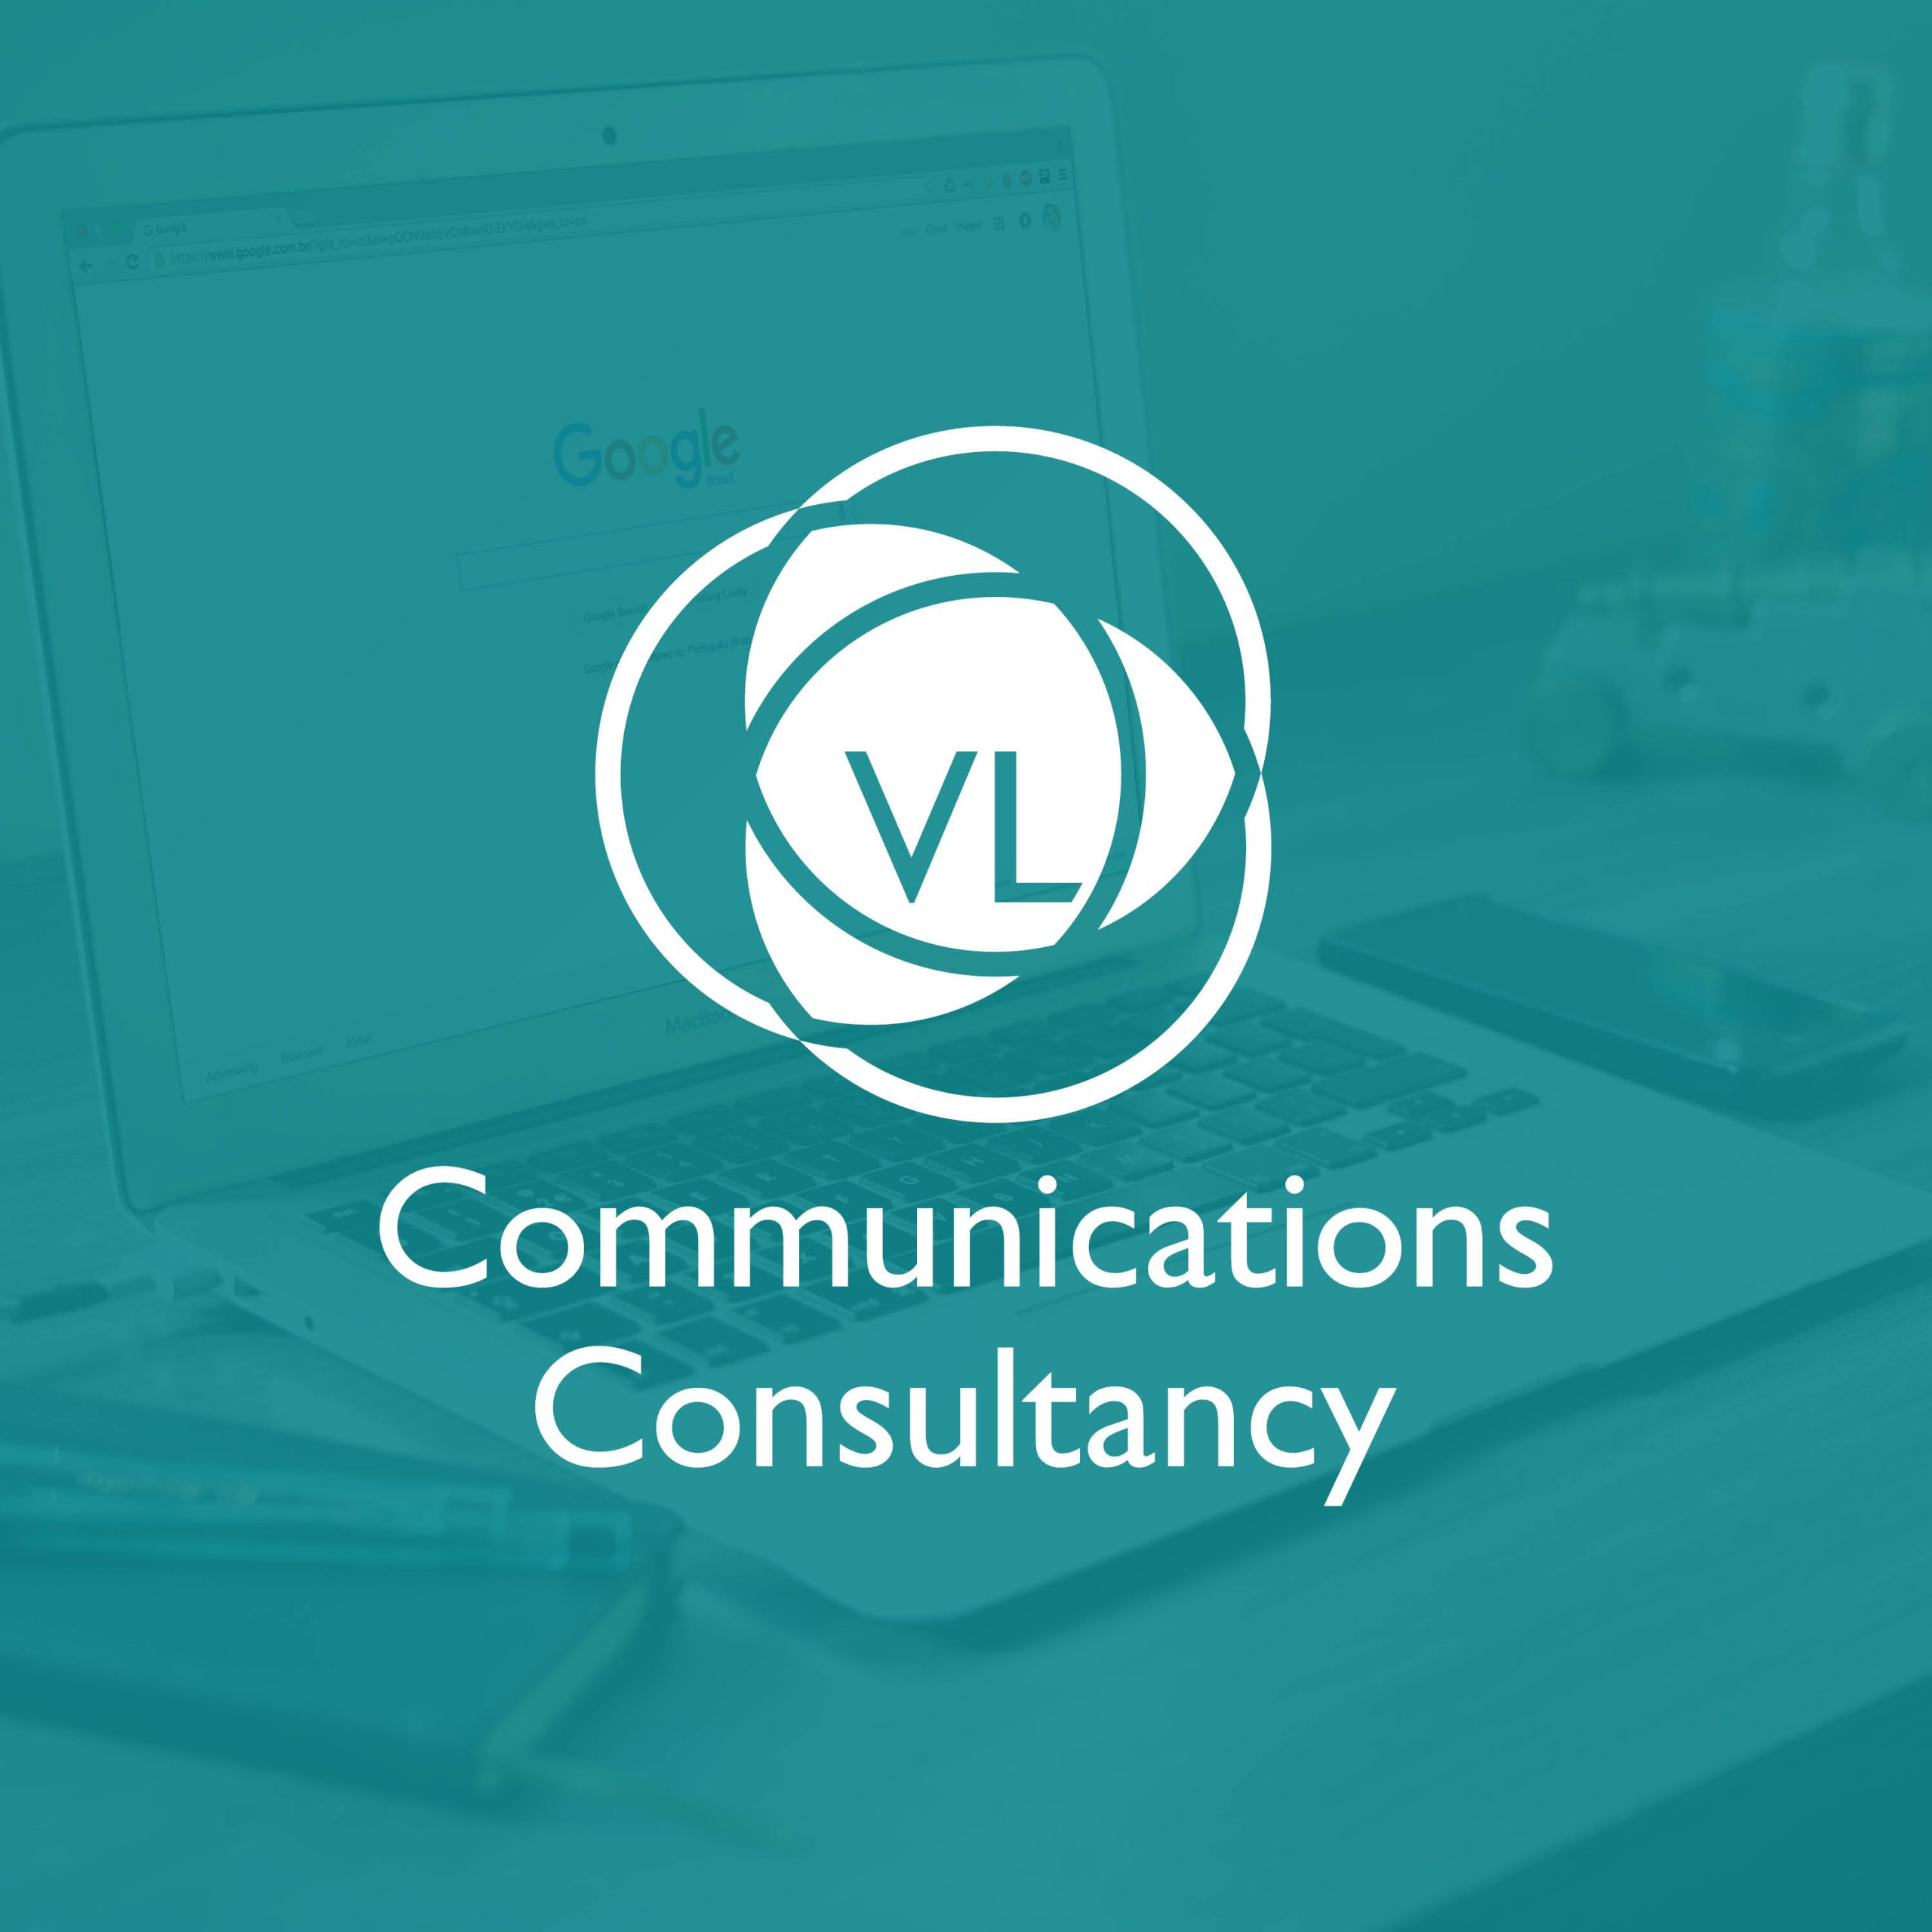 VL Communications Consultancy Branding Logo Design near Bristol